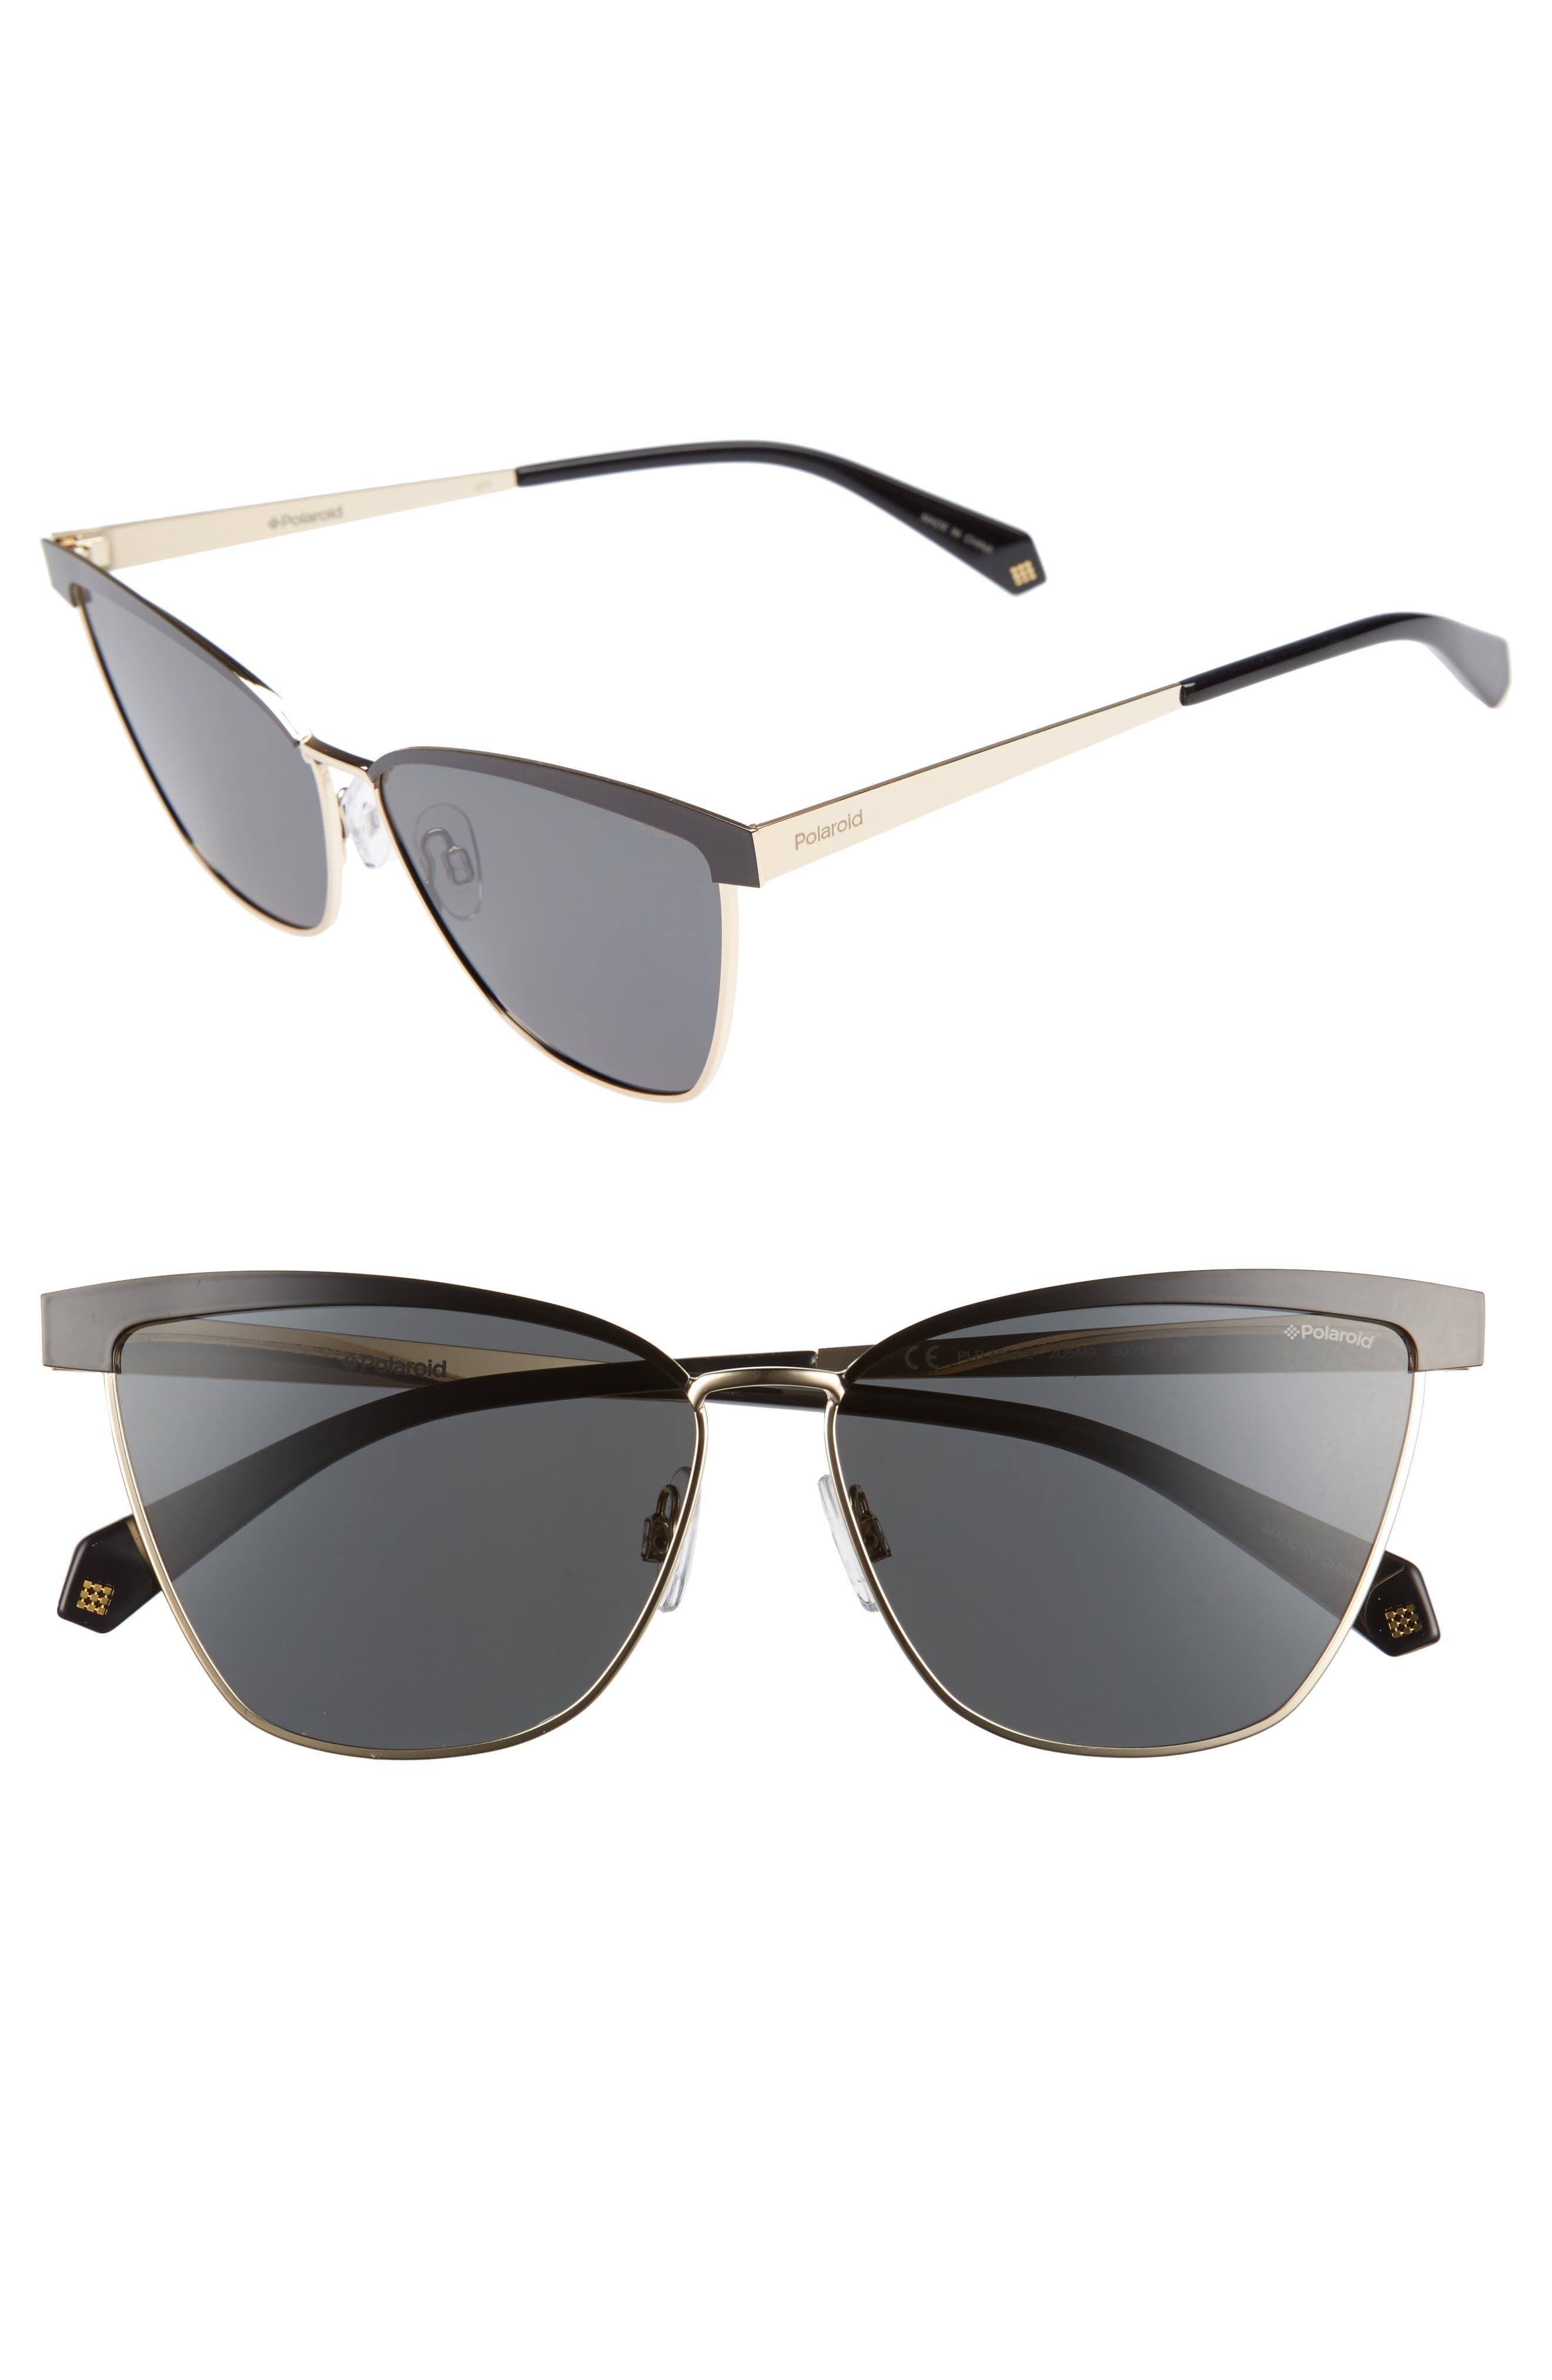 60mm Polarized Cat Eye Sunglasses,                             Main thumbnail 1, color,